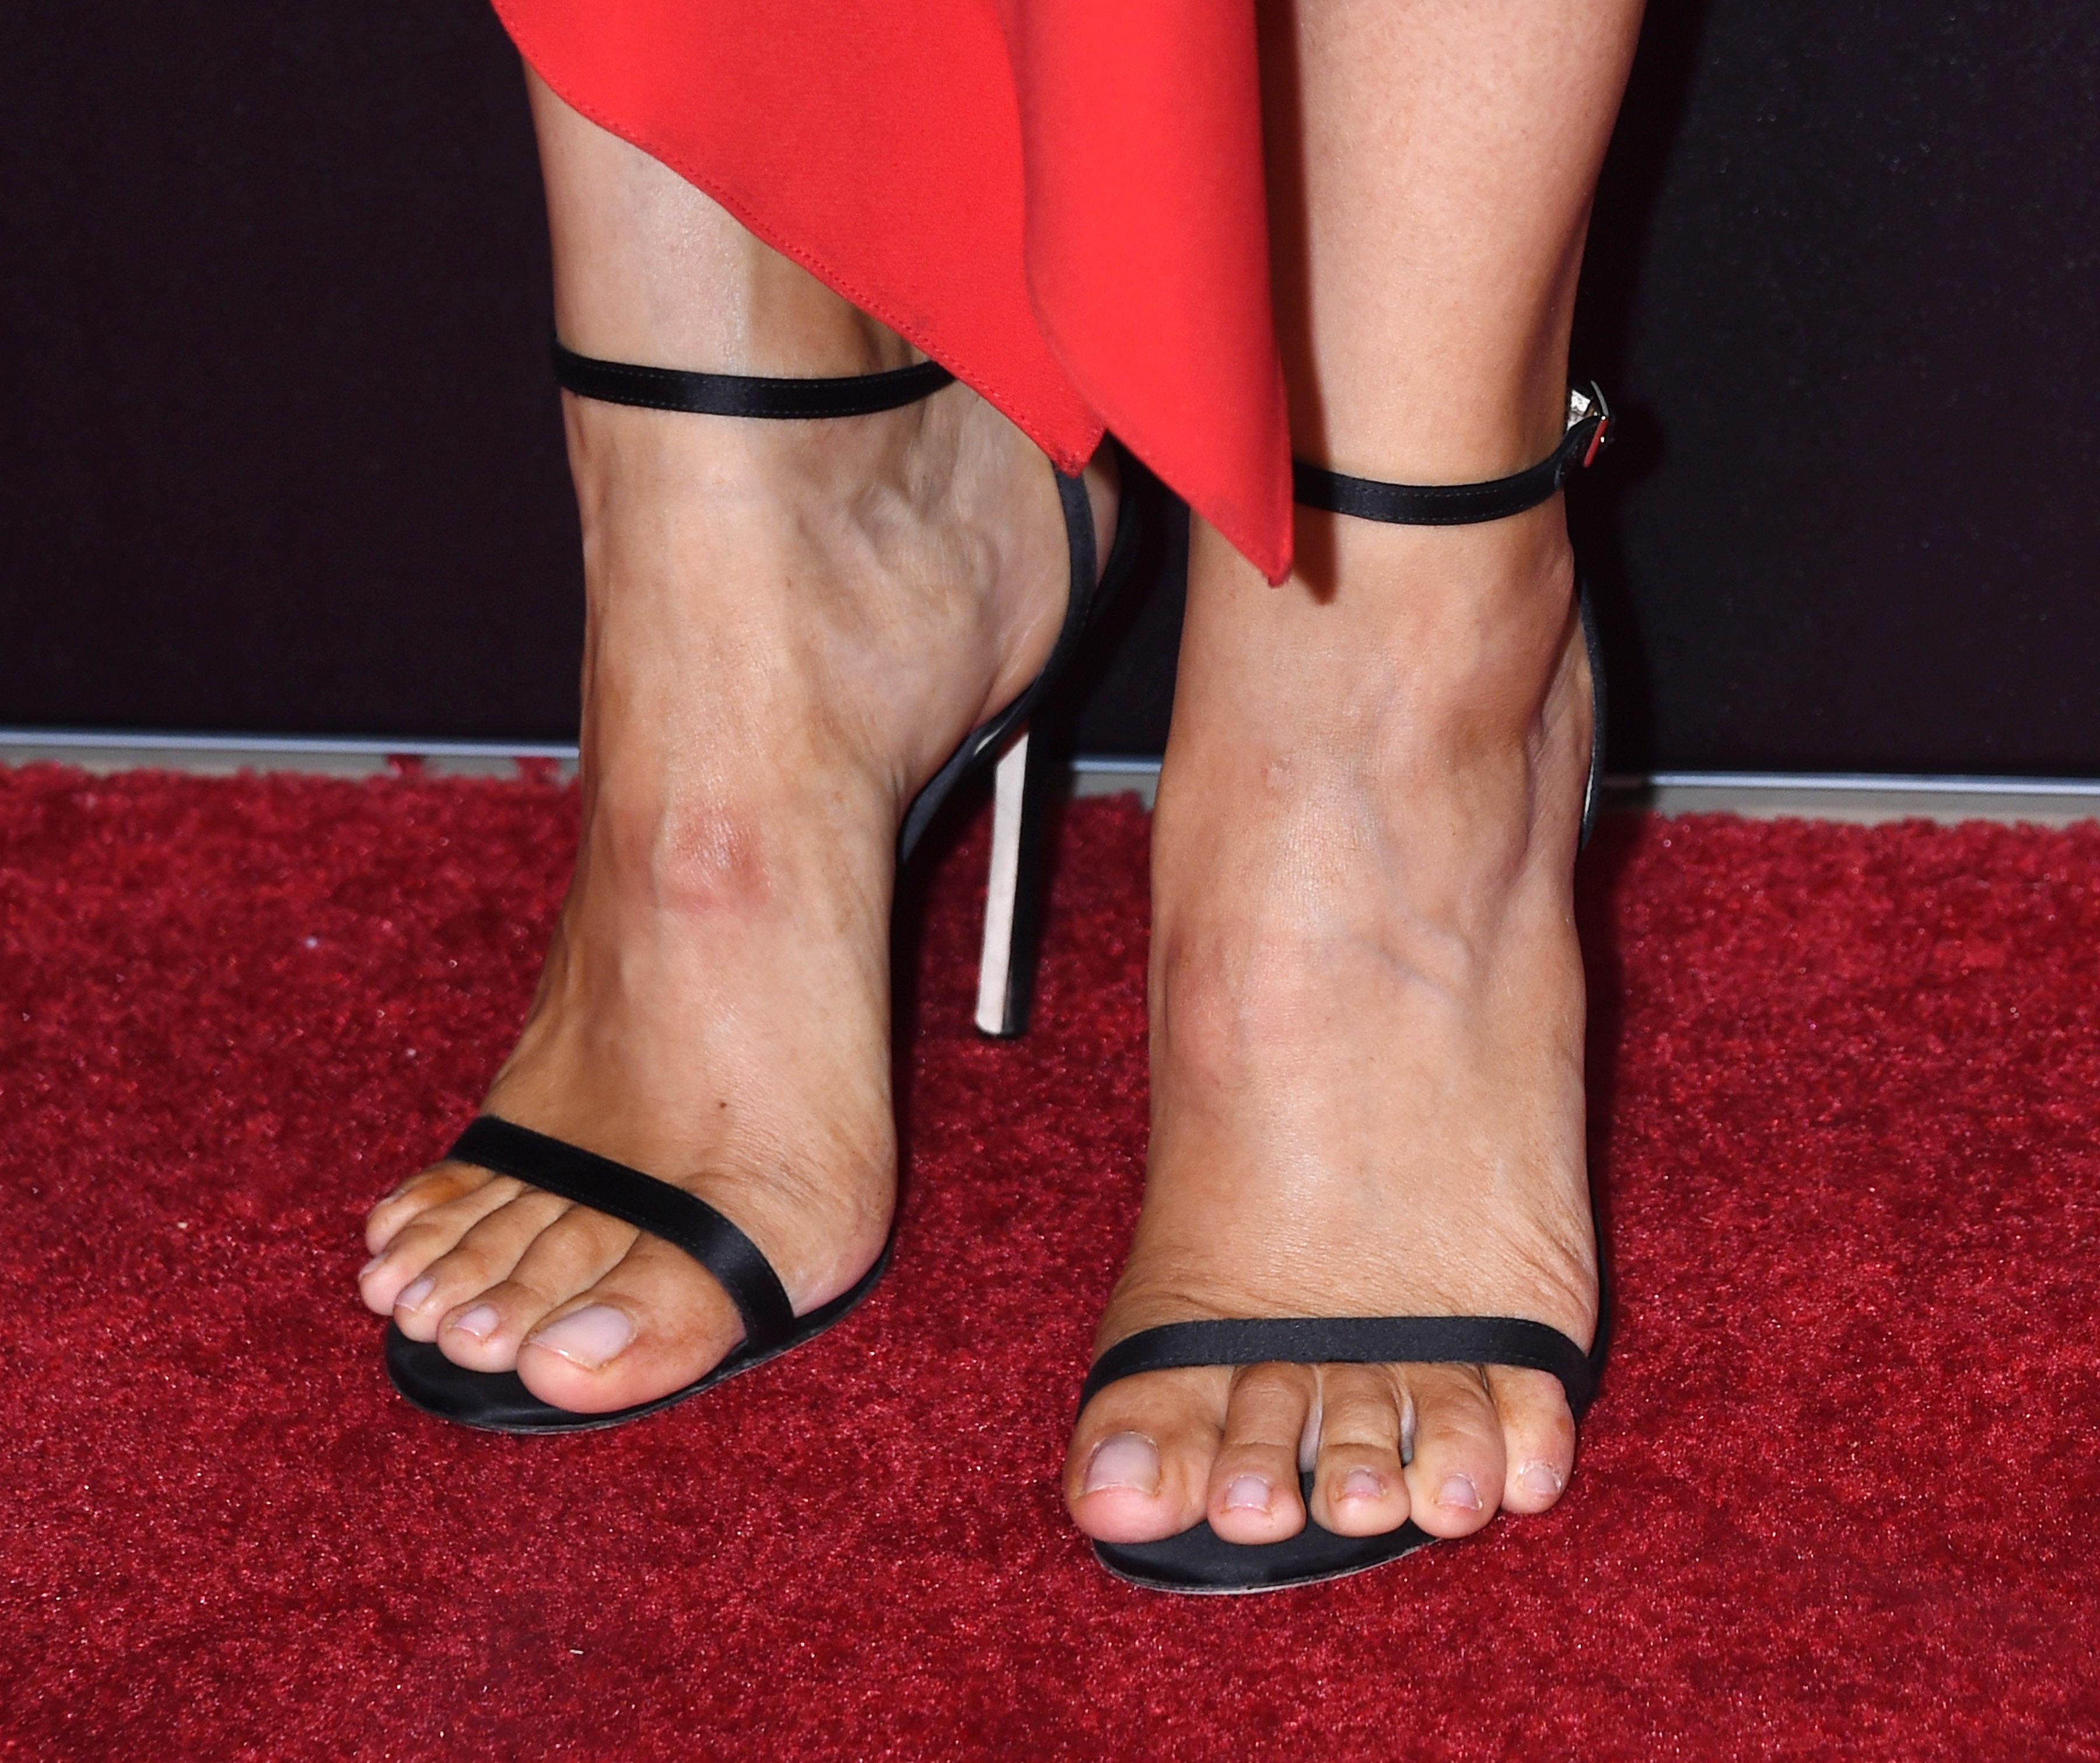 Feet Jennifer Garner nudes (15 photos), Sexy, Leaked, Feet, cameltoe 2018